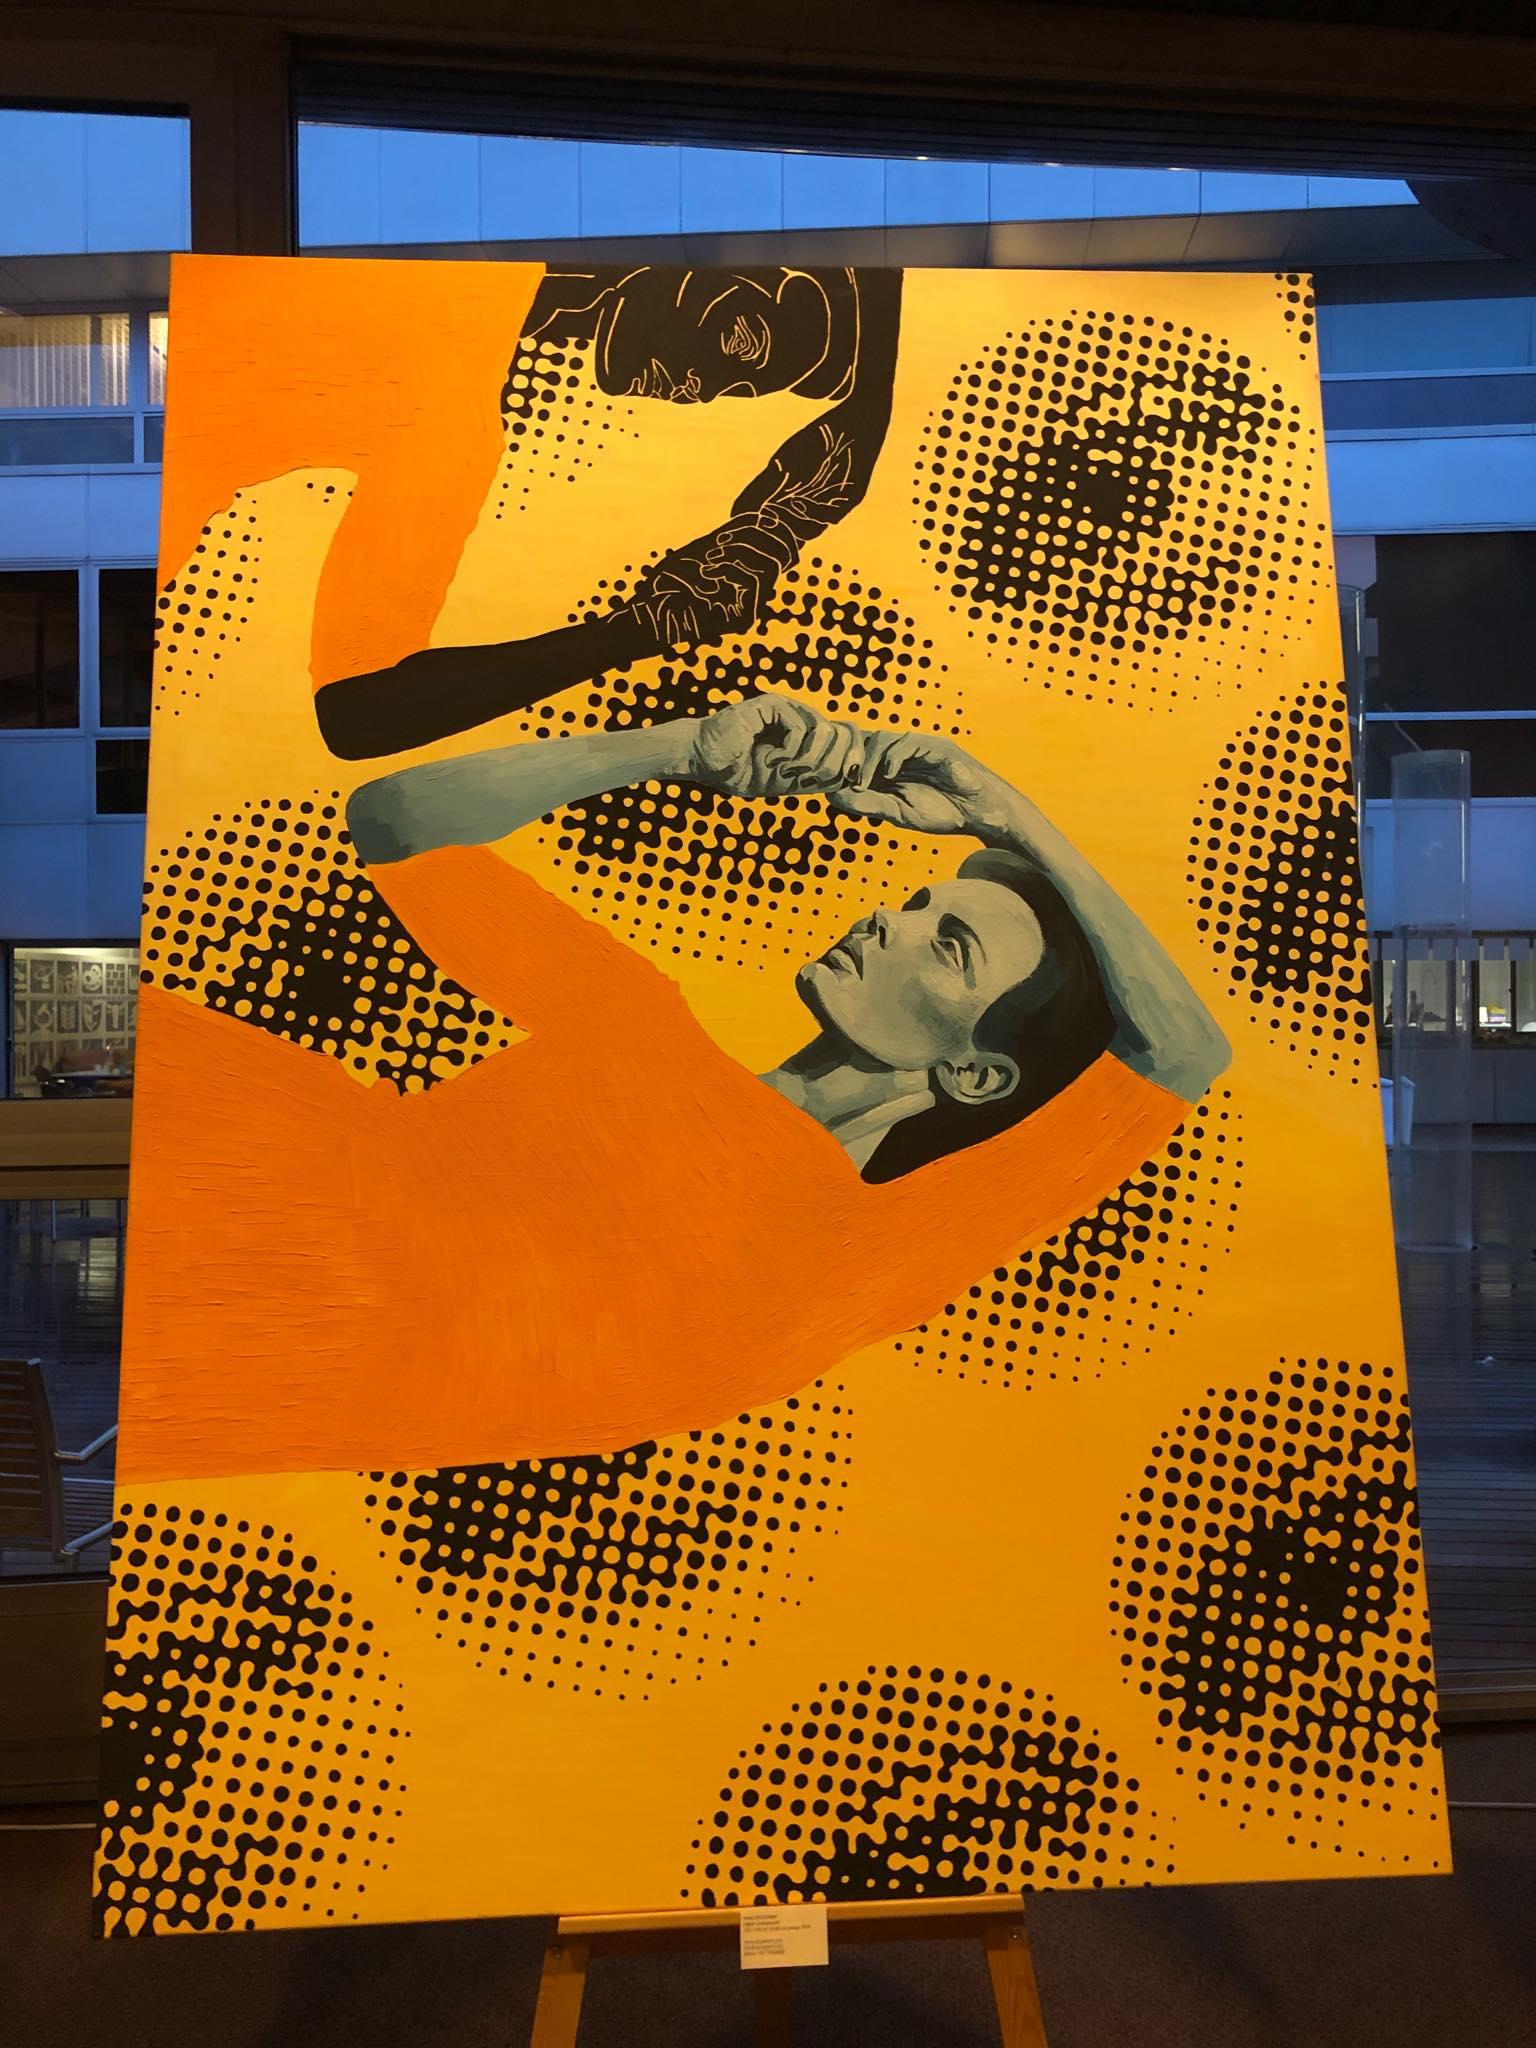 expoziție la Strasbourg